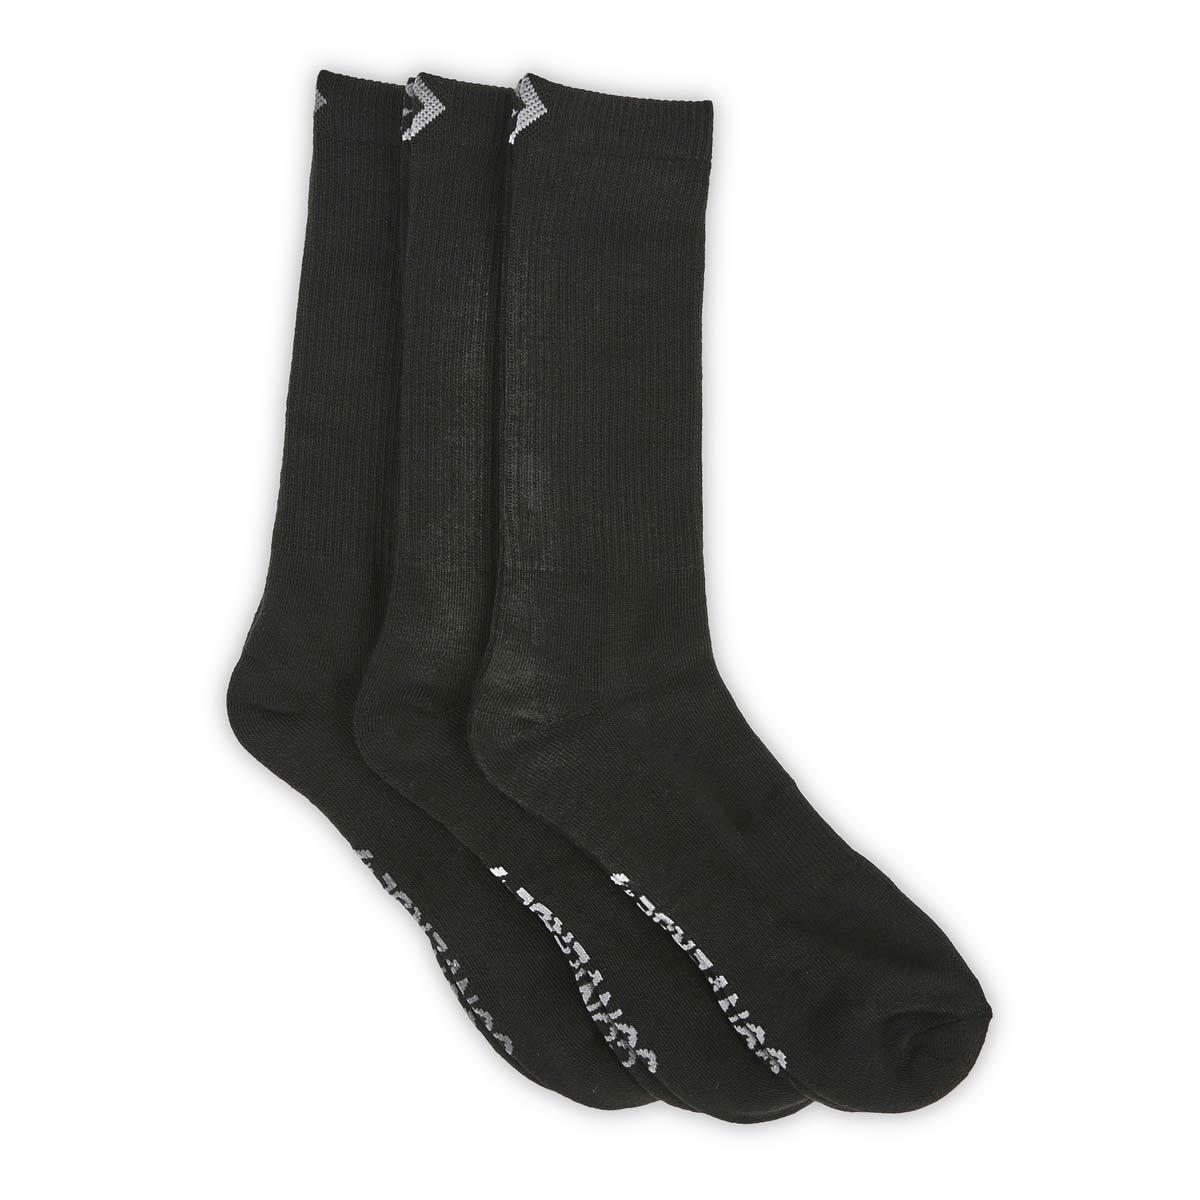 Mns Converse HalfCushionCrew bk sock 3pk